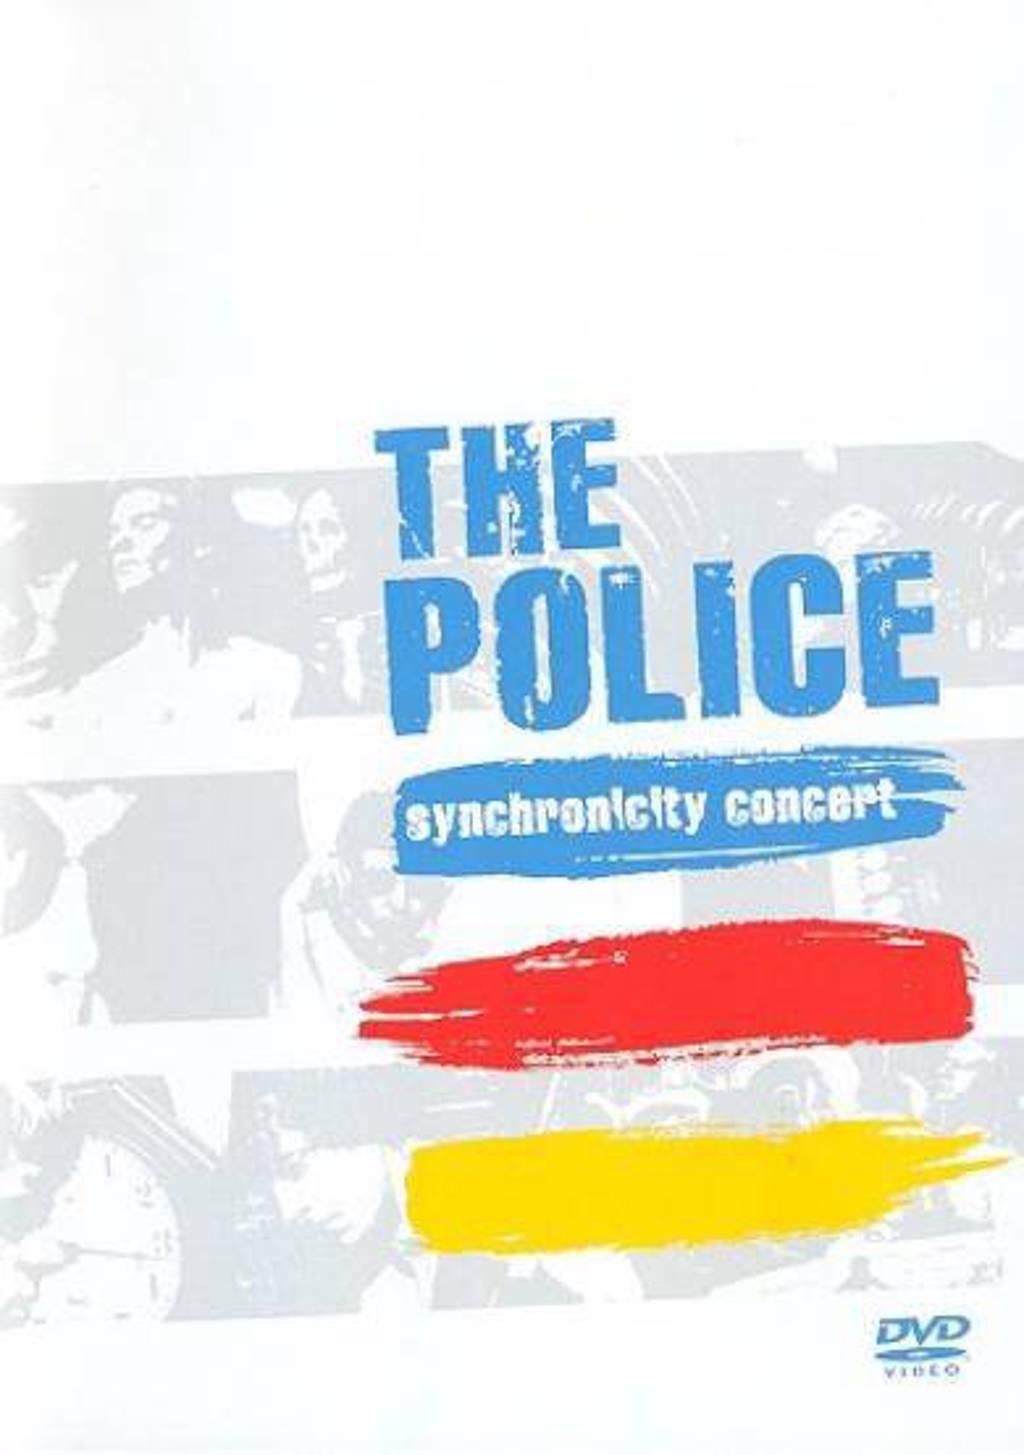 Police - synchronicity concert (DVD)